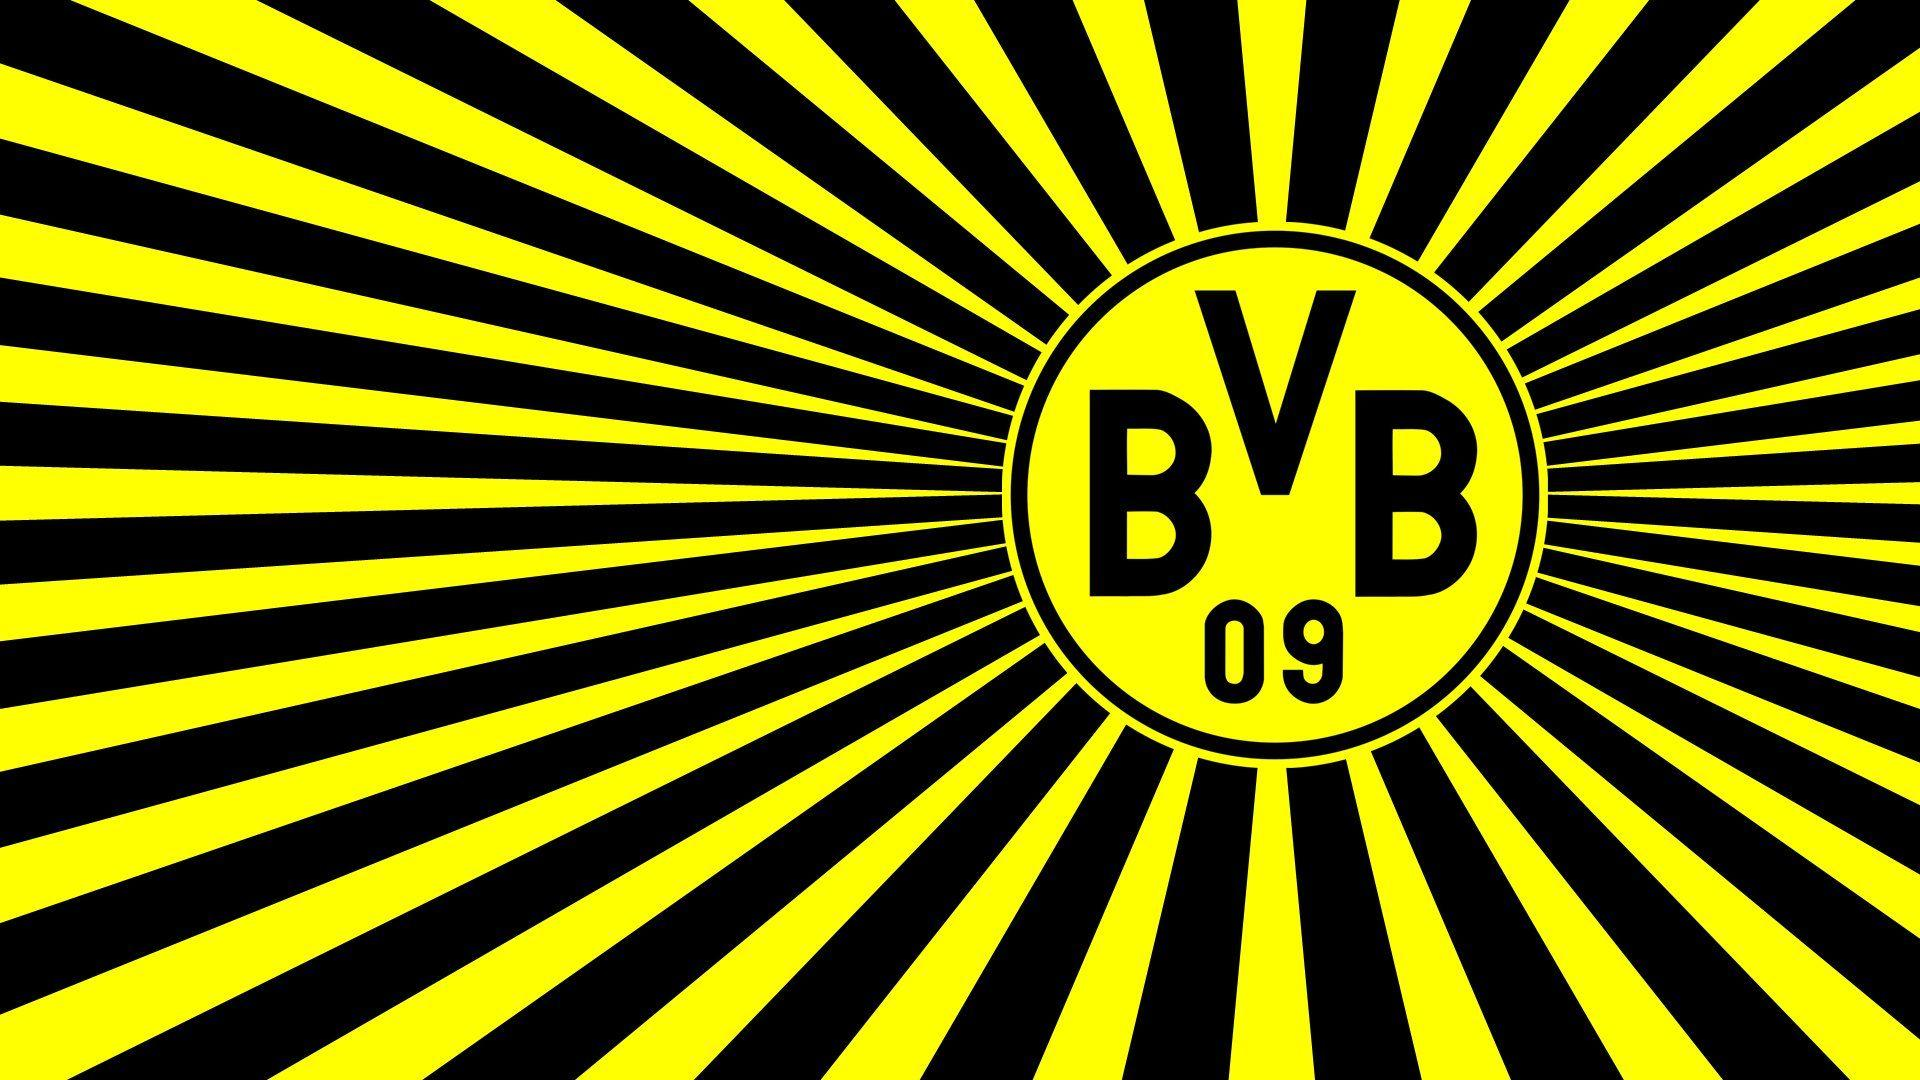 Borussia dortmund wallpapers wallpaper cave borussia dortmund wallpaper voltagebd Choice Image